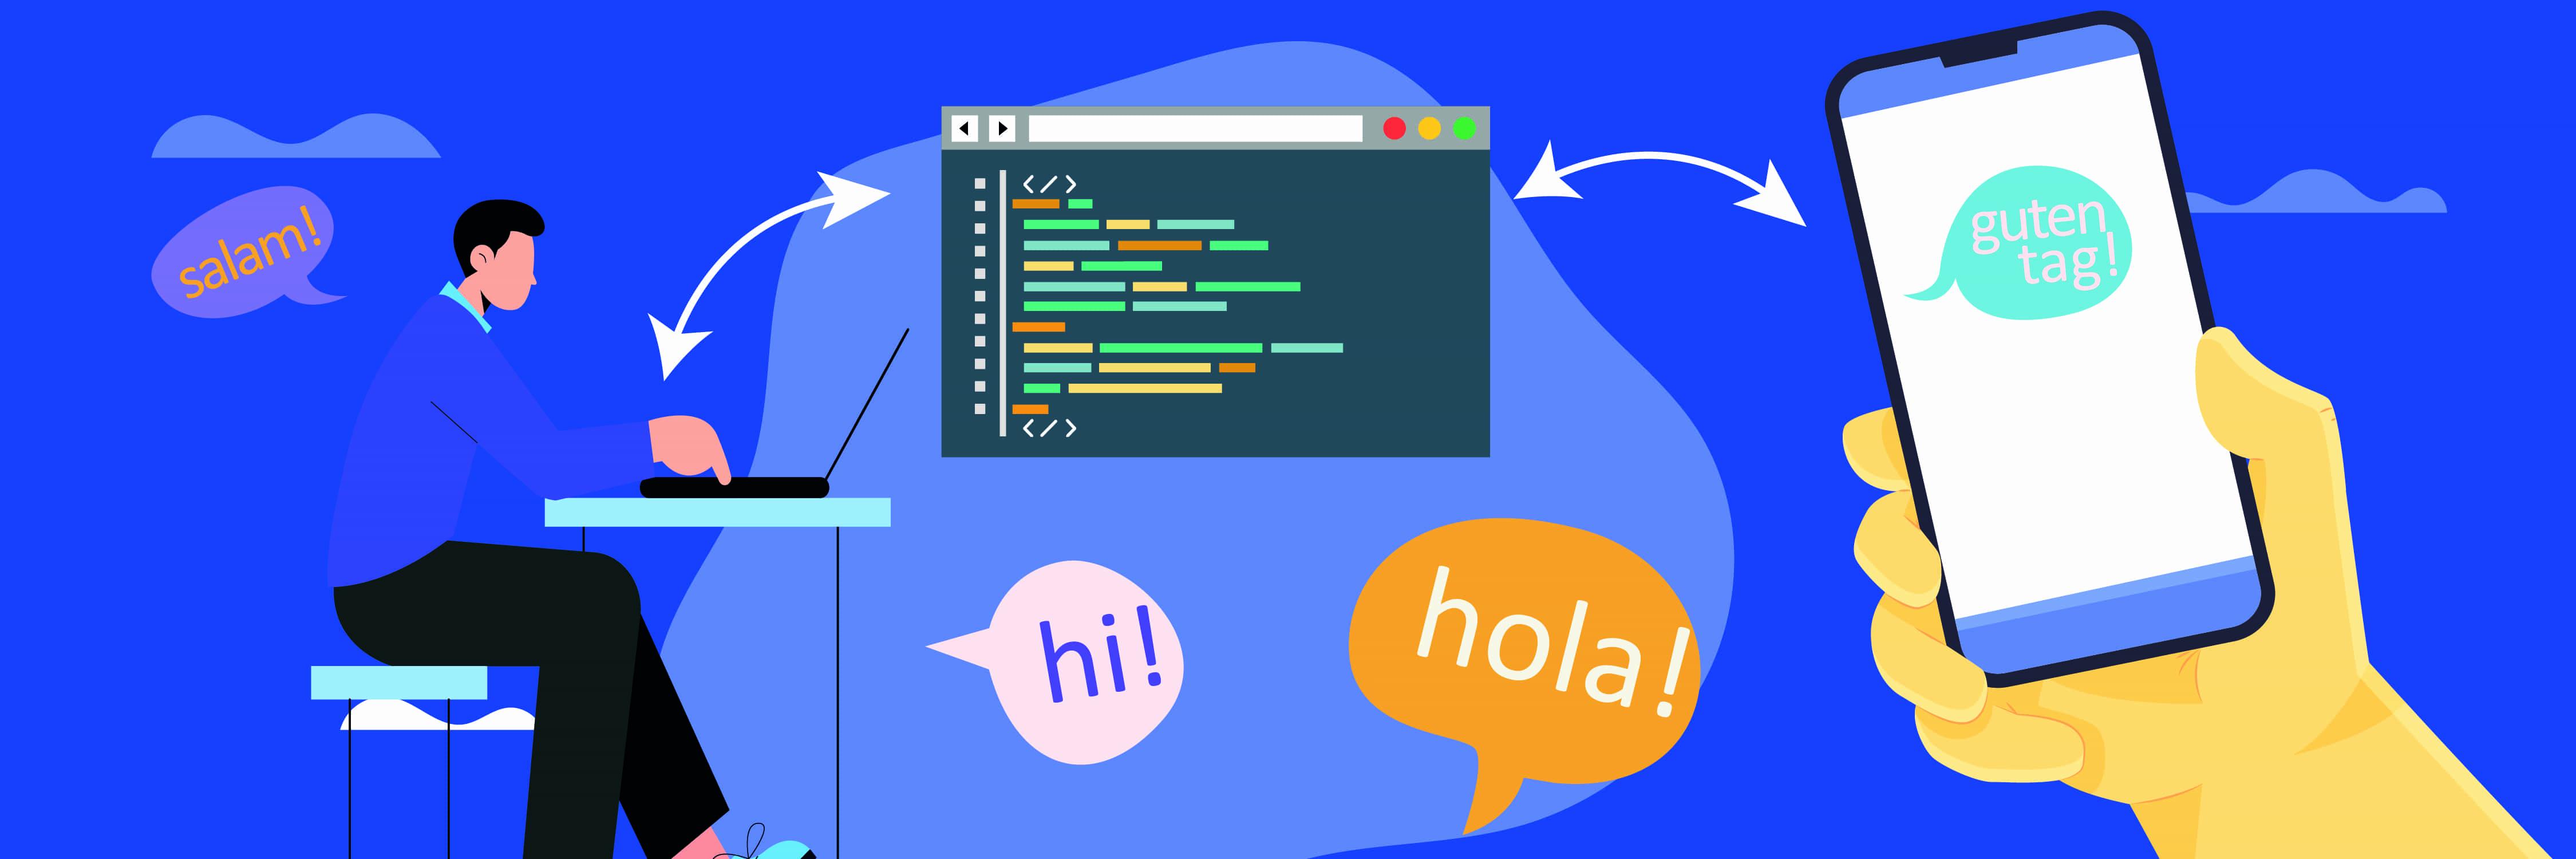 trados translation tool